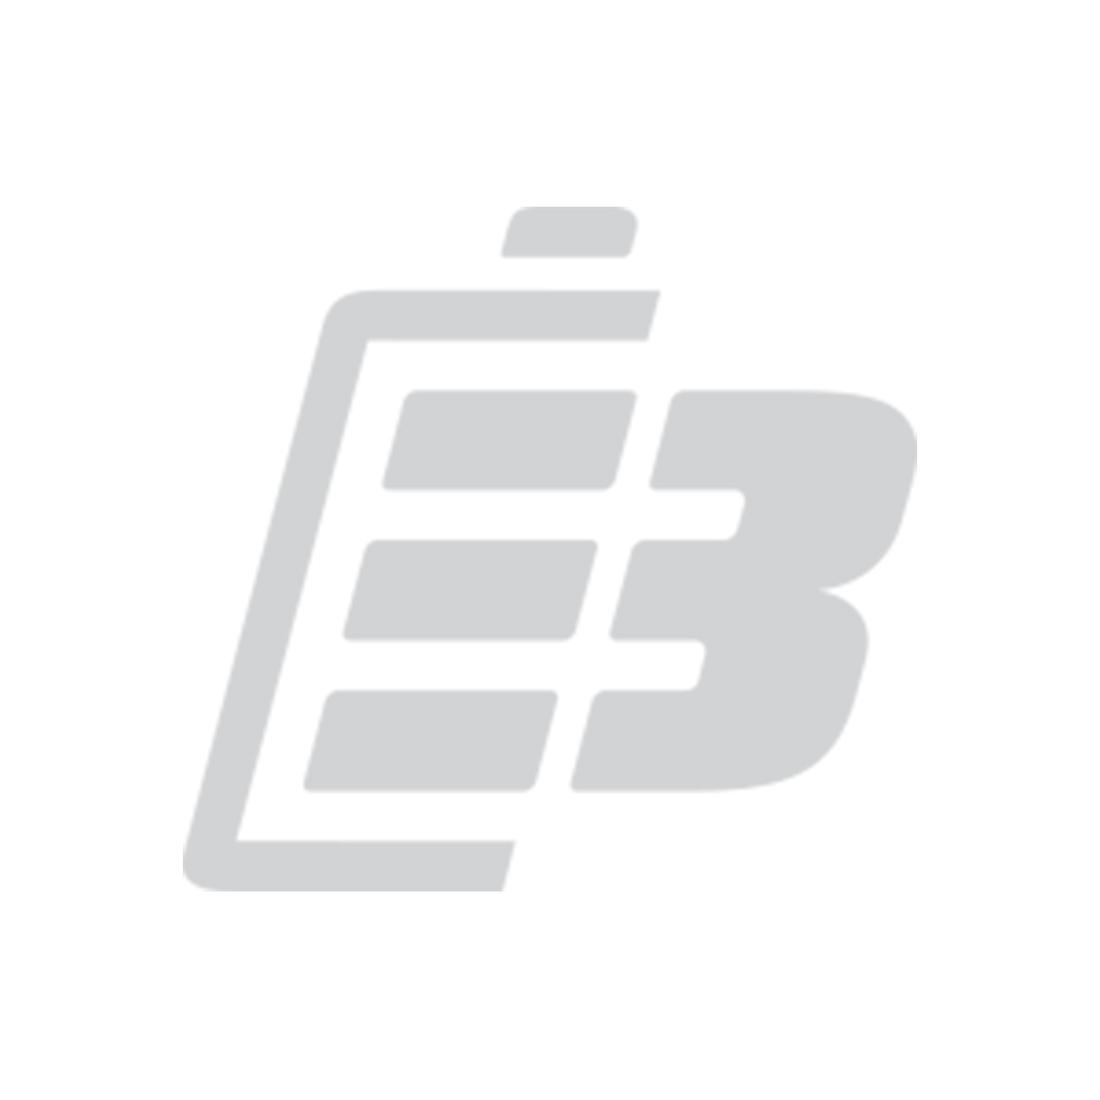 Netbook battery Acer Aspire One D250 4400mah black_1